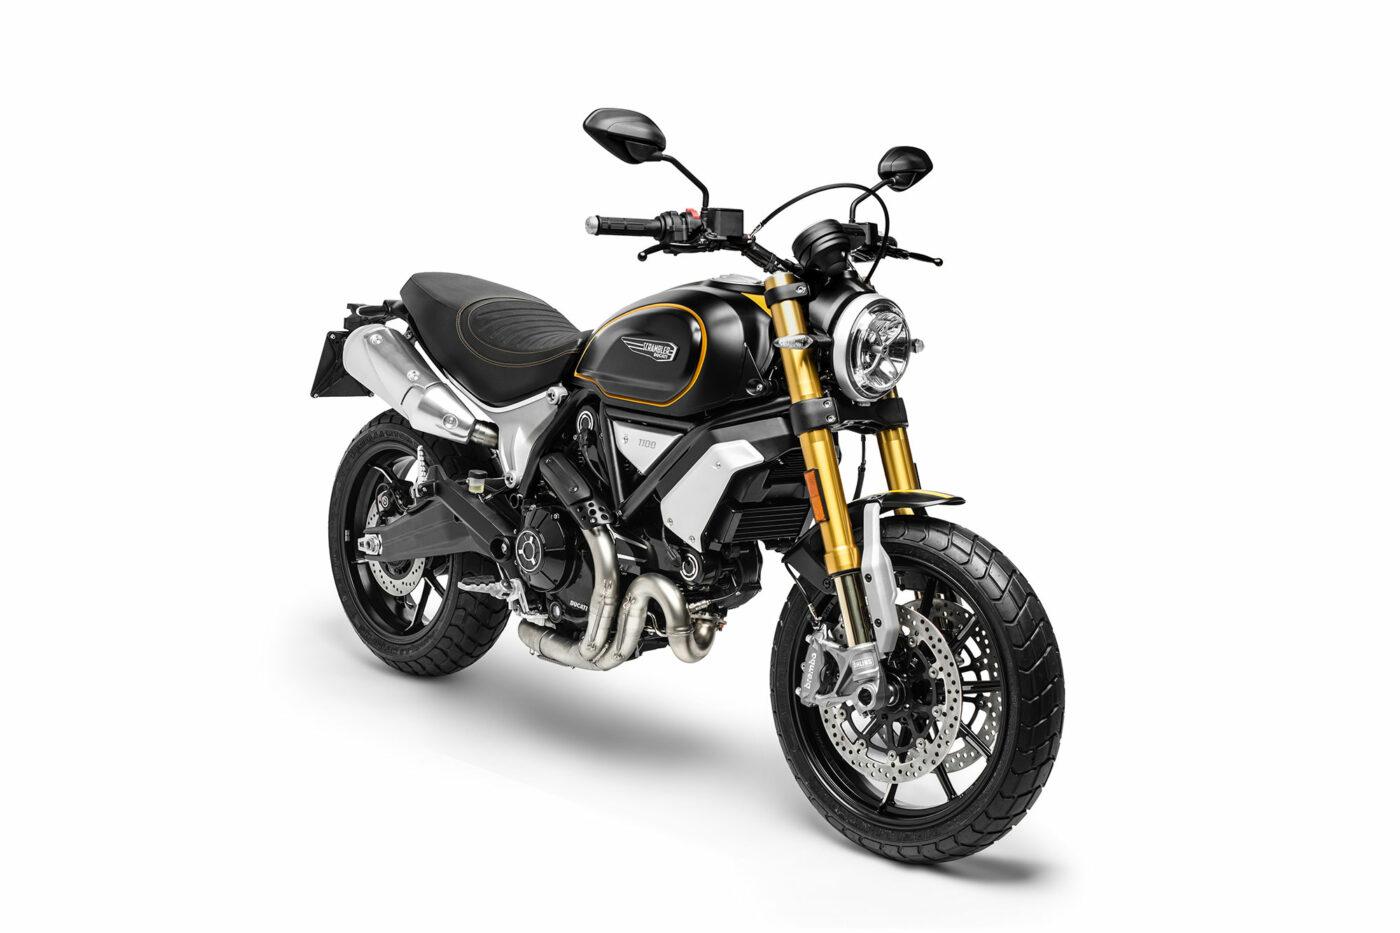 Ducati Scrambler 1100 Special Front Side